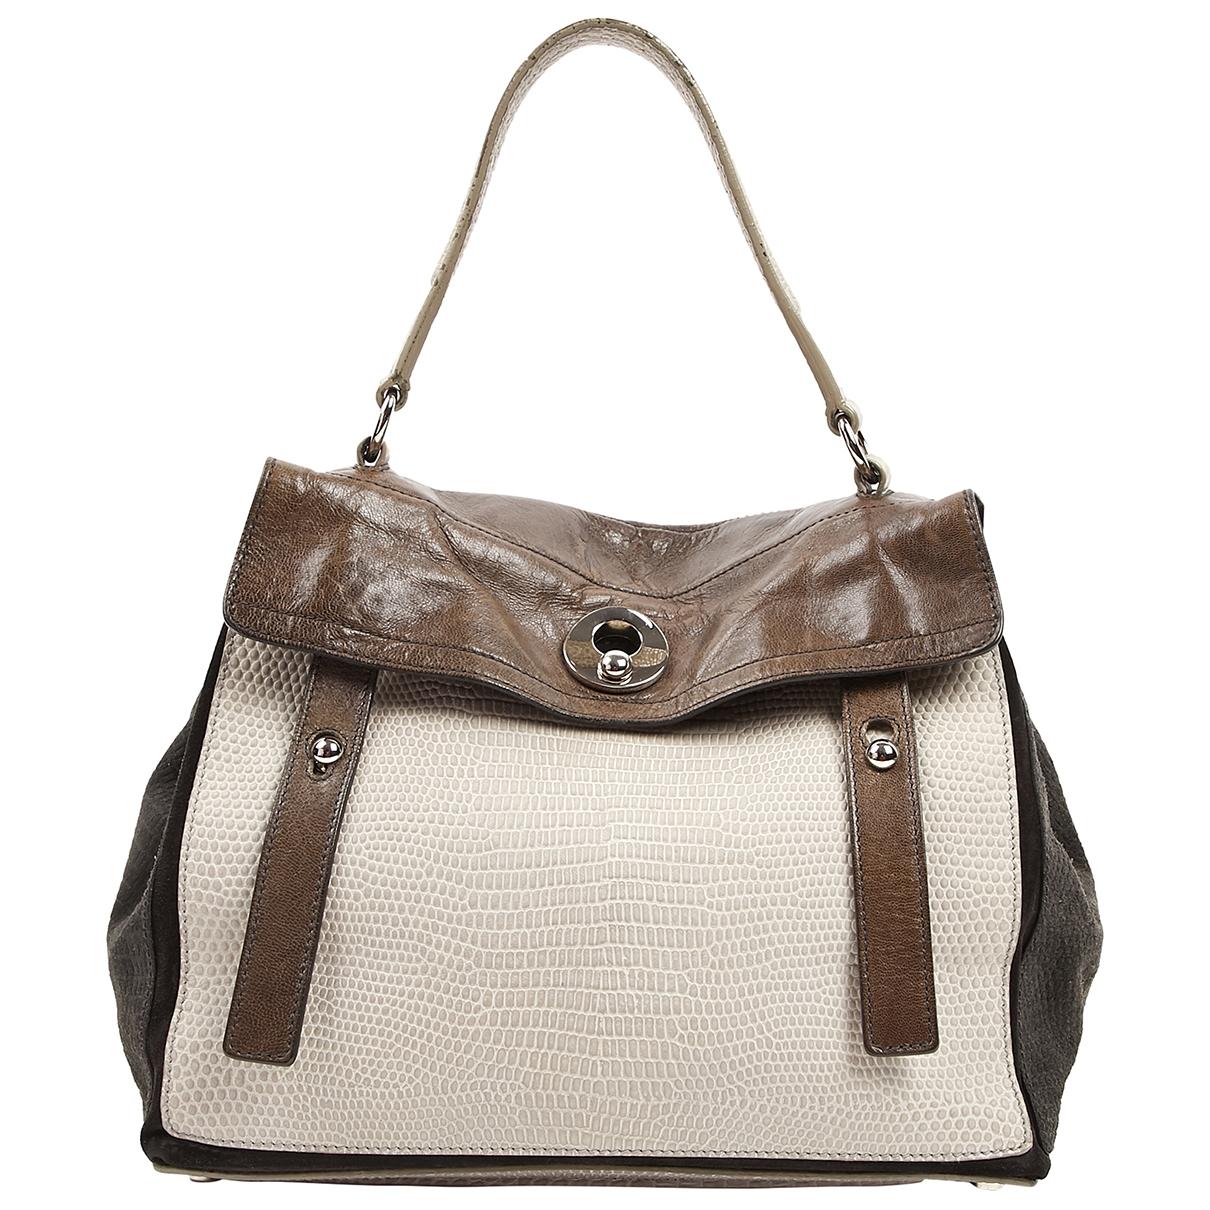 Yves Saint Laurent Muse Two Handtasche in  Braun Leder